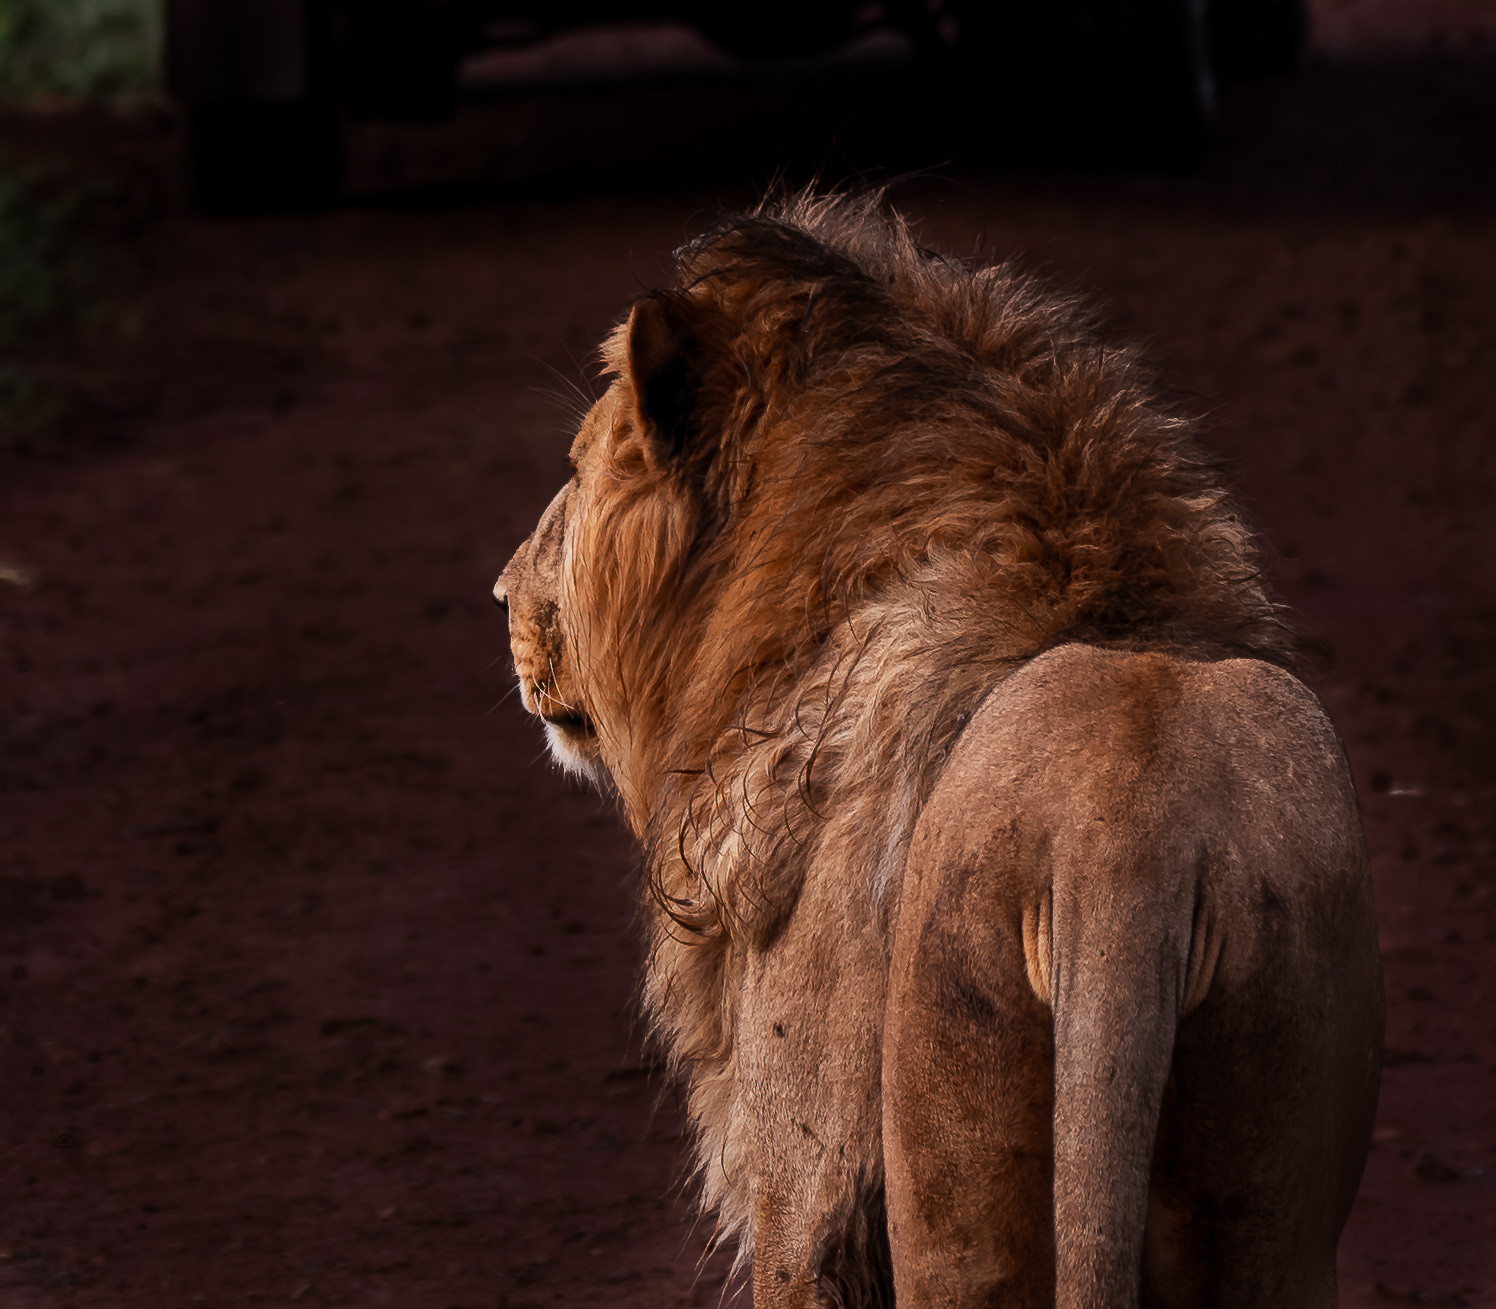 28oct_lion2.jpg